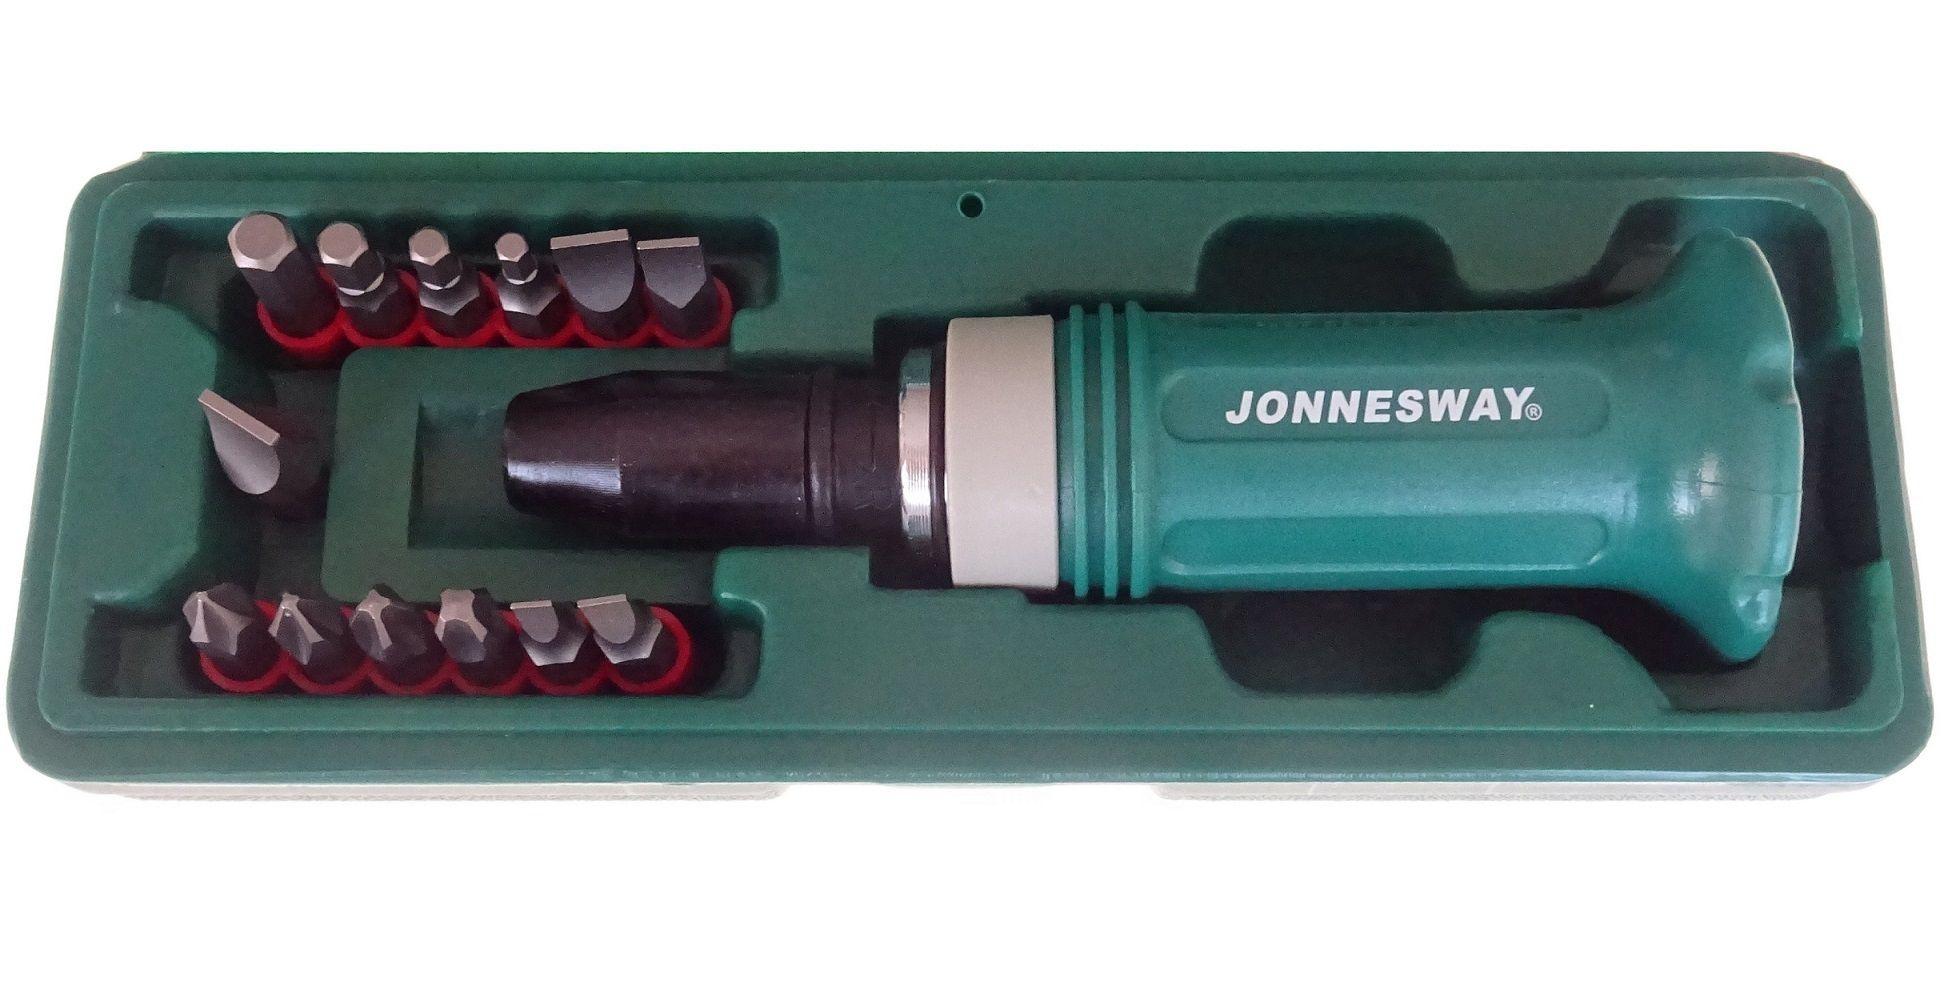 "Úderový / rázový šroubovák s adaptérem 1/2""- JONNESWAY AG010138"